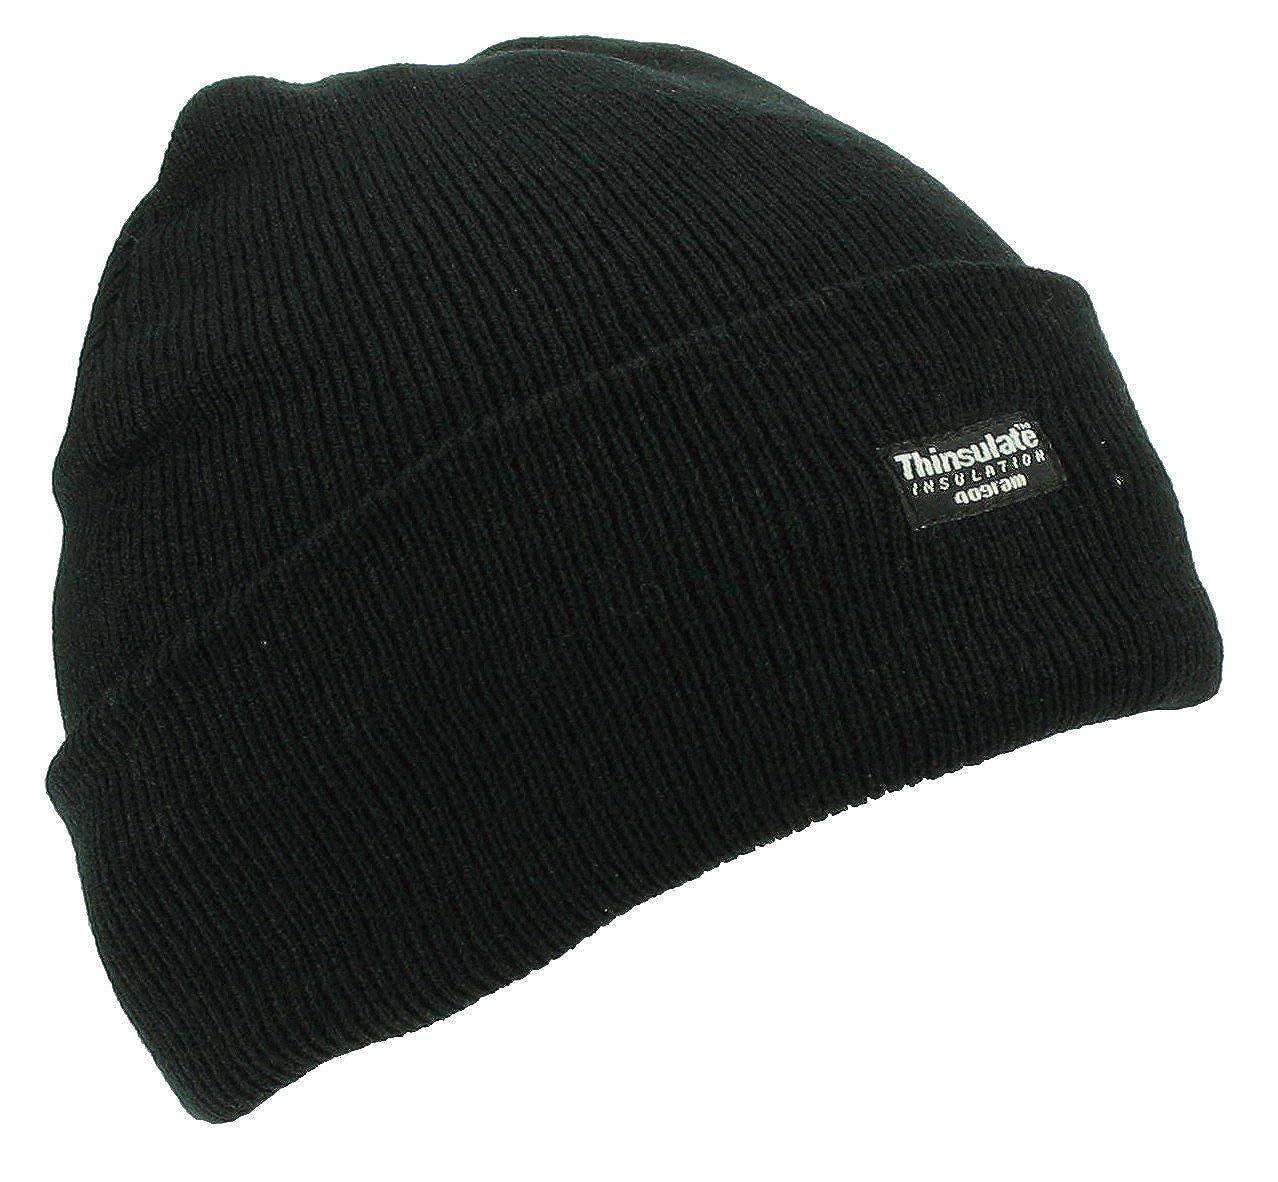 Thinsulate Knitted Hat - Black  Amazon.co.uk  Clothing 680f8c484ca